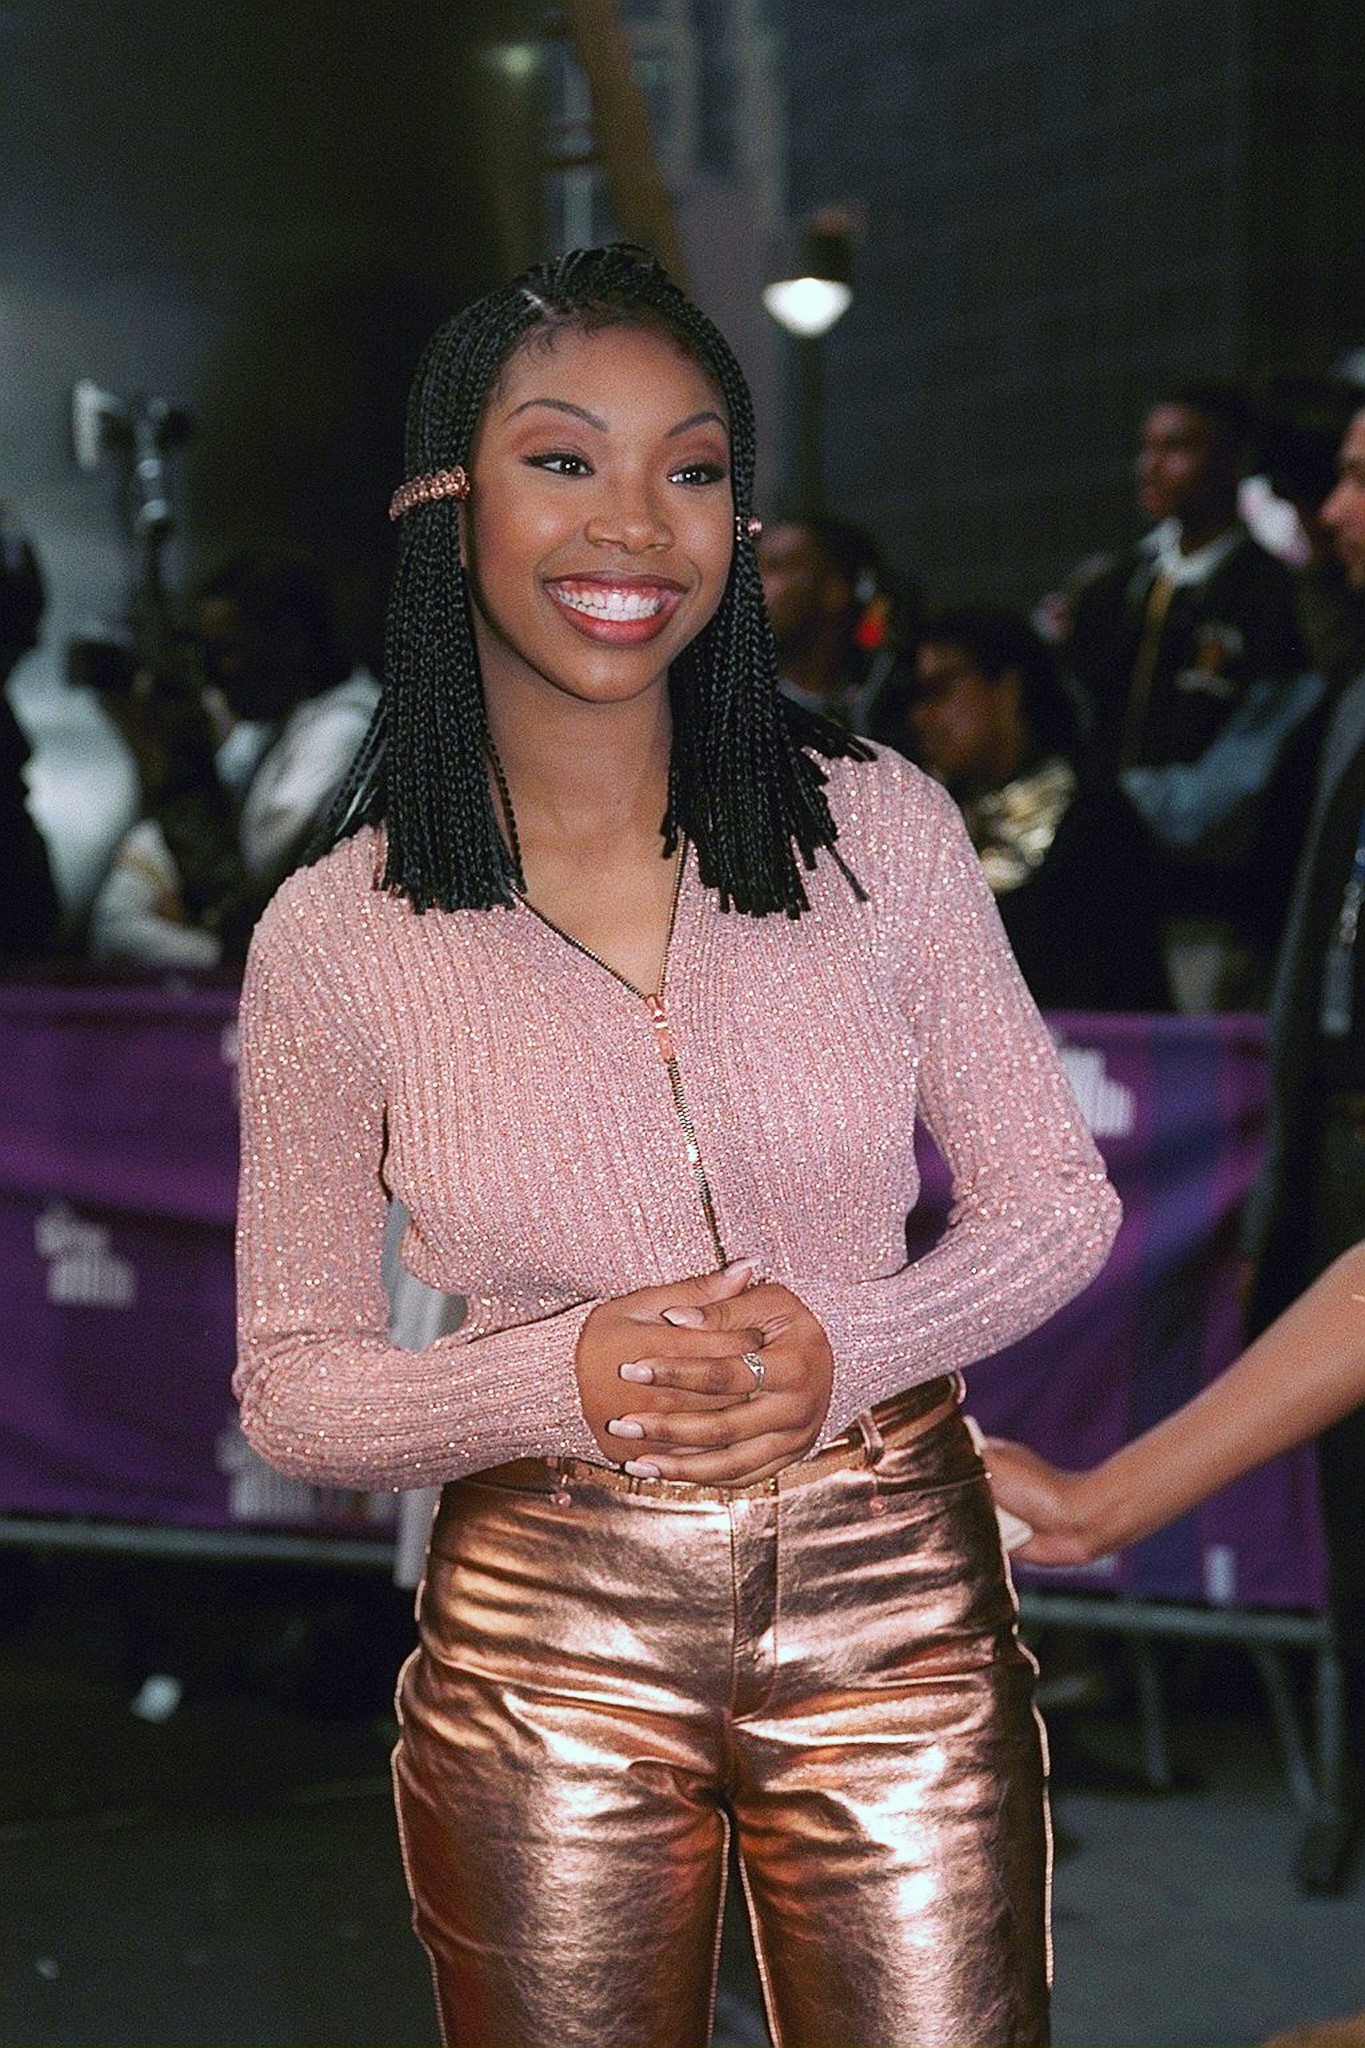 Singer Brandy attending Essence Awards at Madison Square Gar